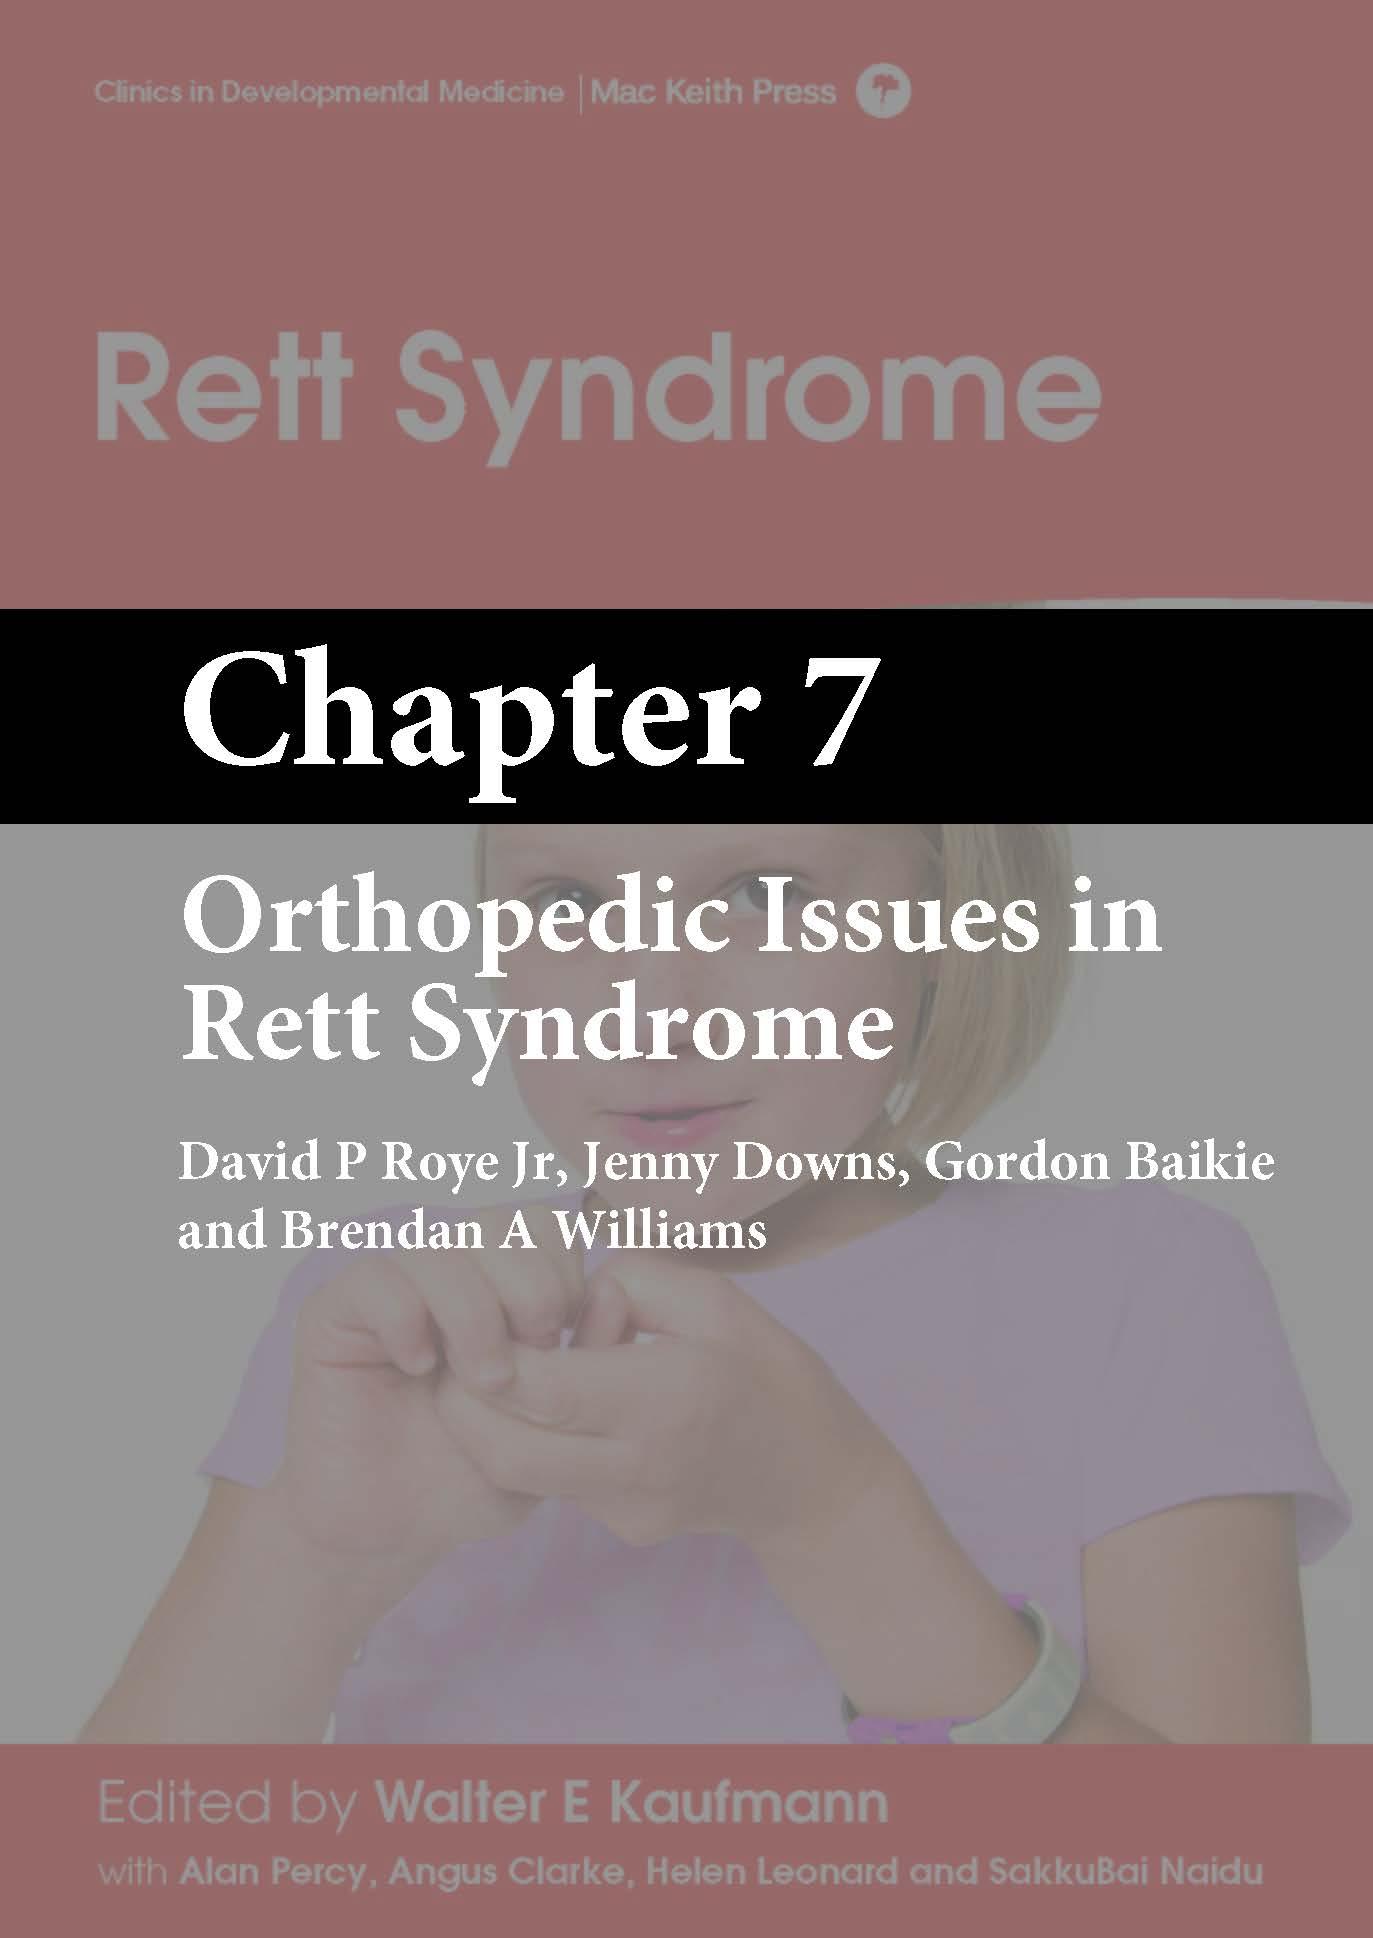 Rett Syndrome, Kaufmann, Chapter 7 cover